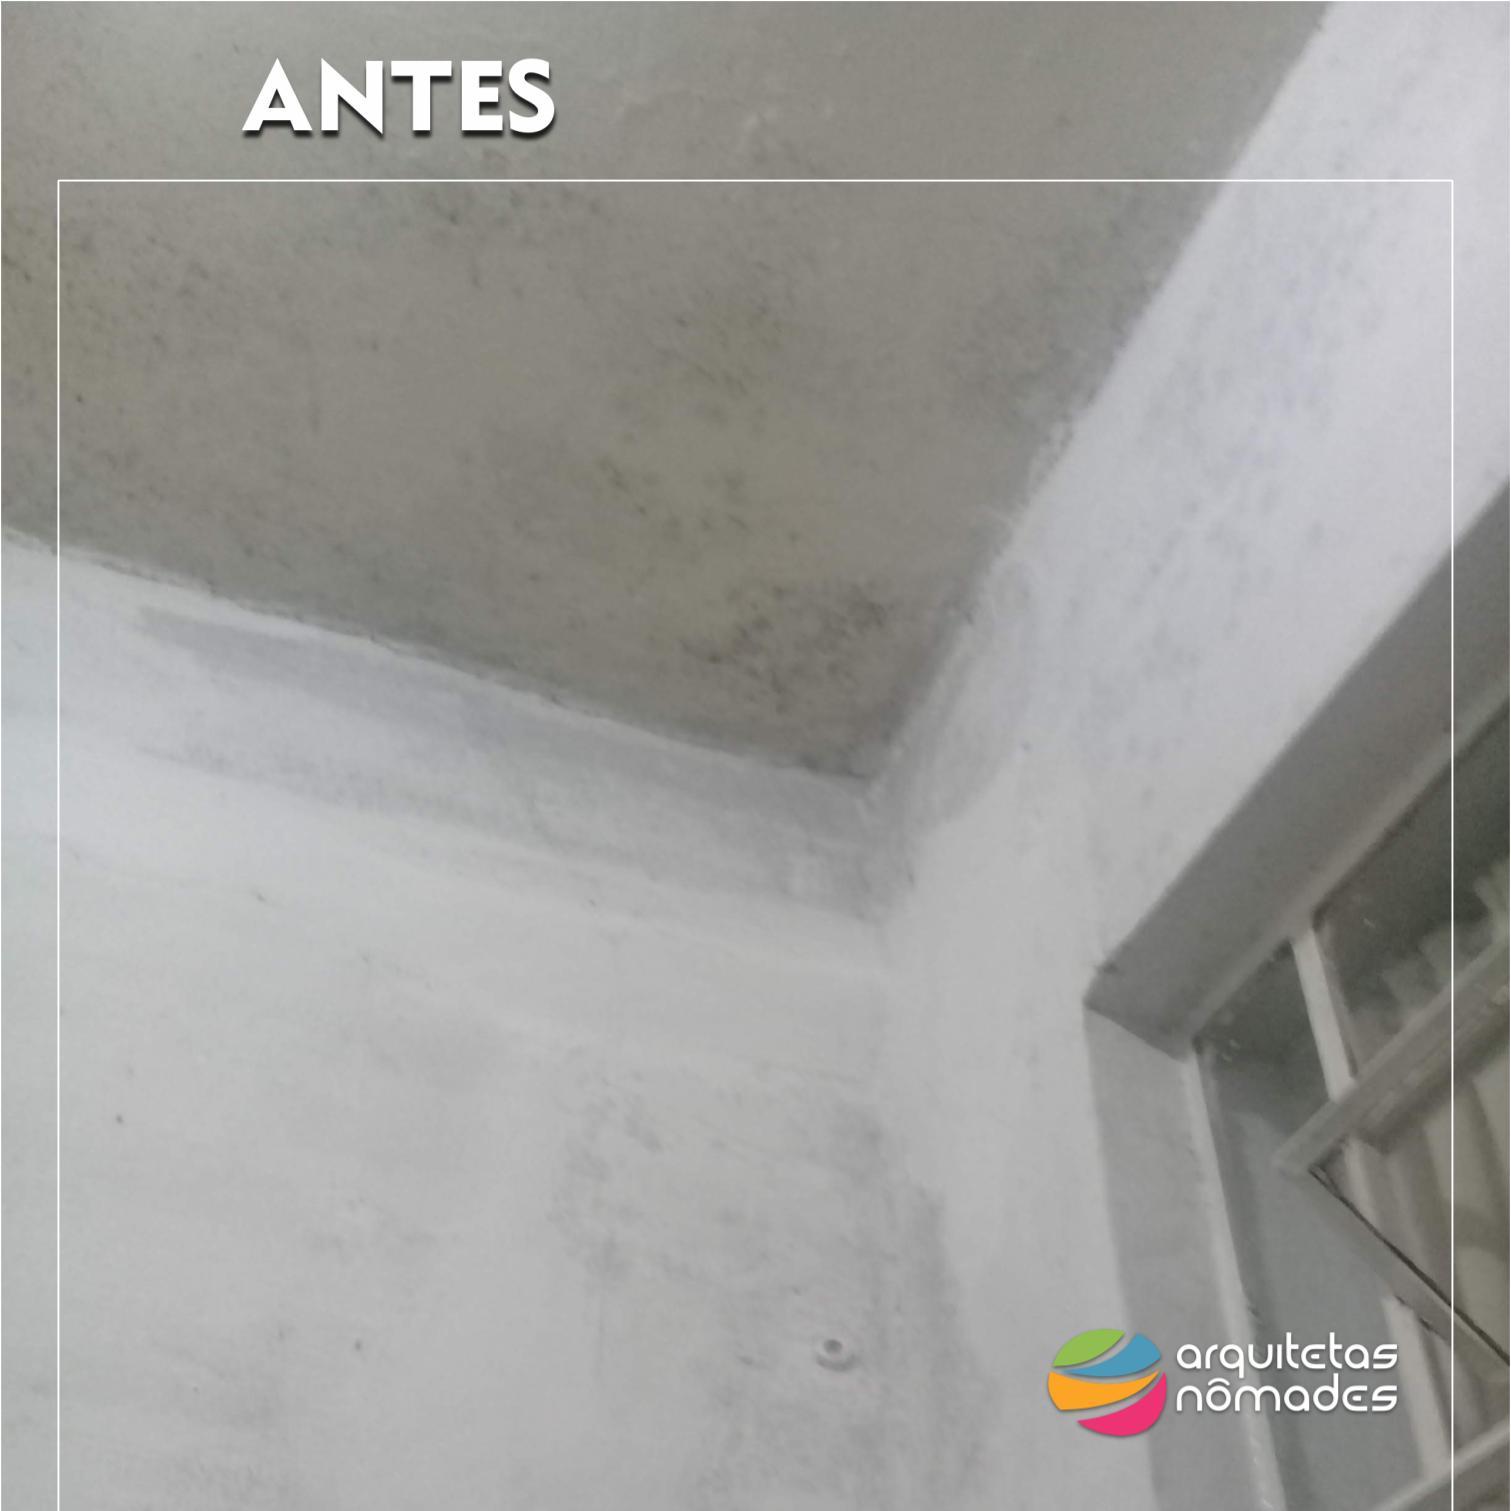 ANTES1-katia